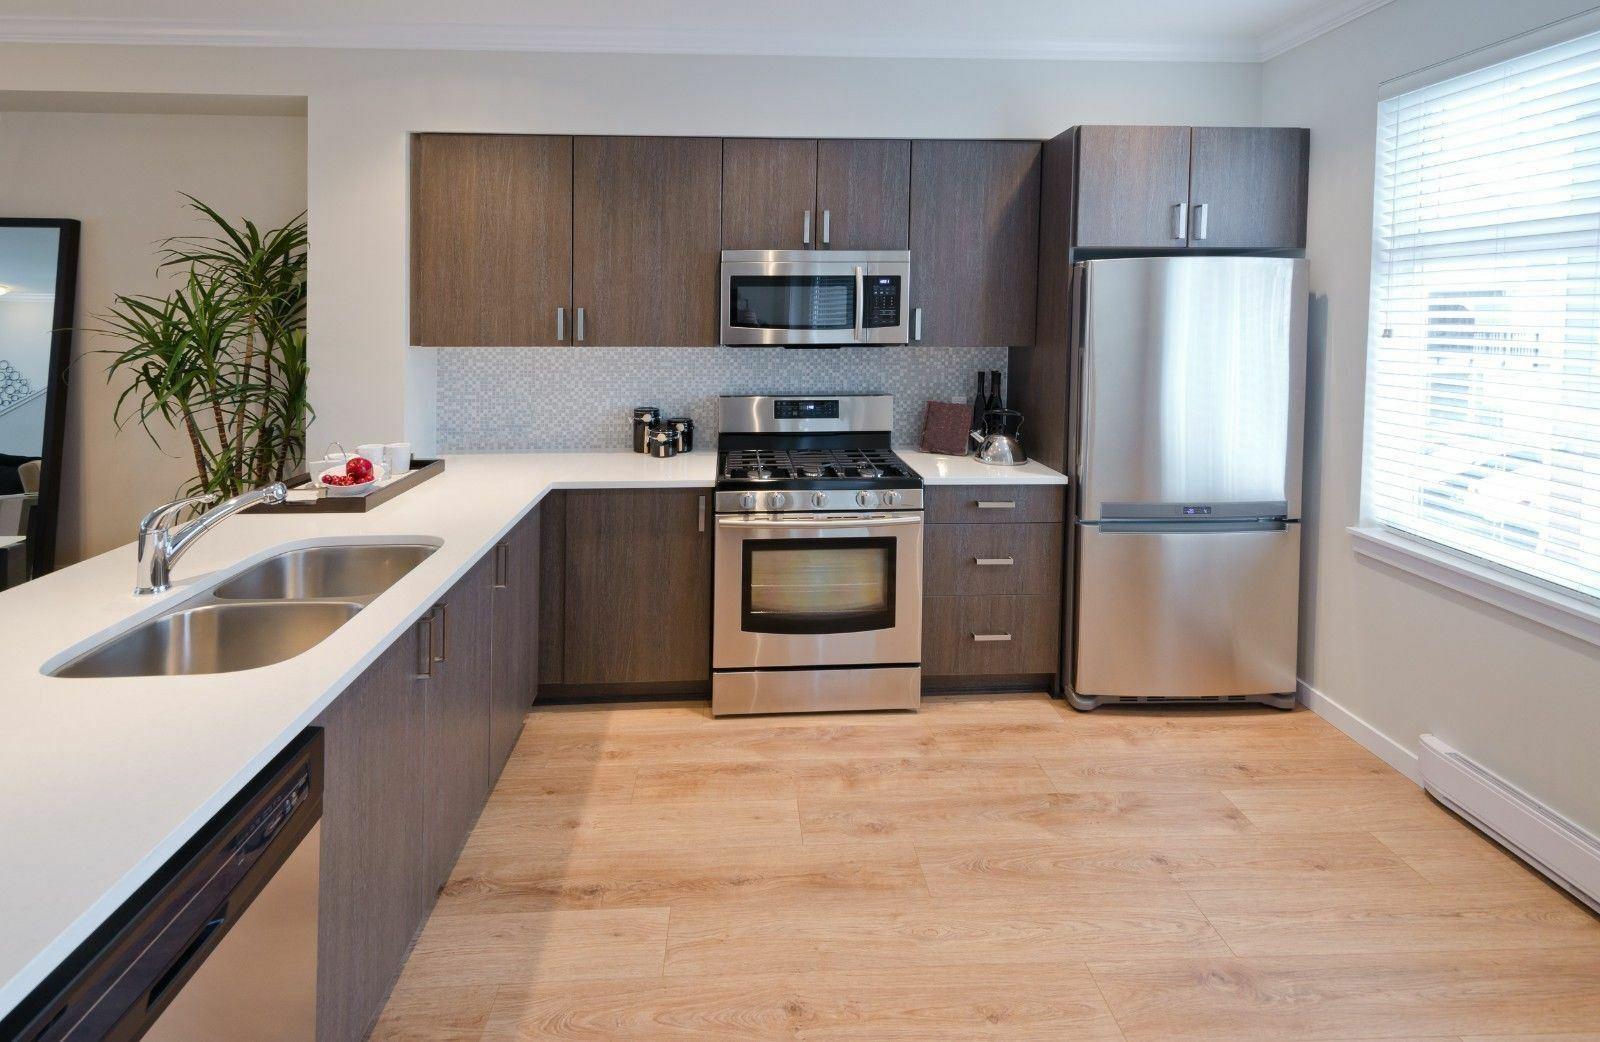 8 Units Walnut Pvc Kitchen Wall Base Units Carcass Cabinet Set Soft Close Doors Cosmobuy